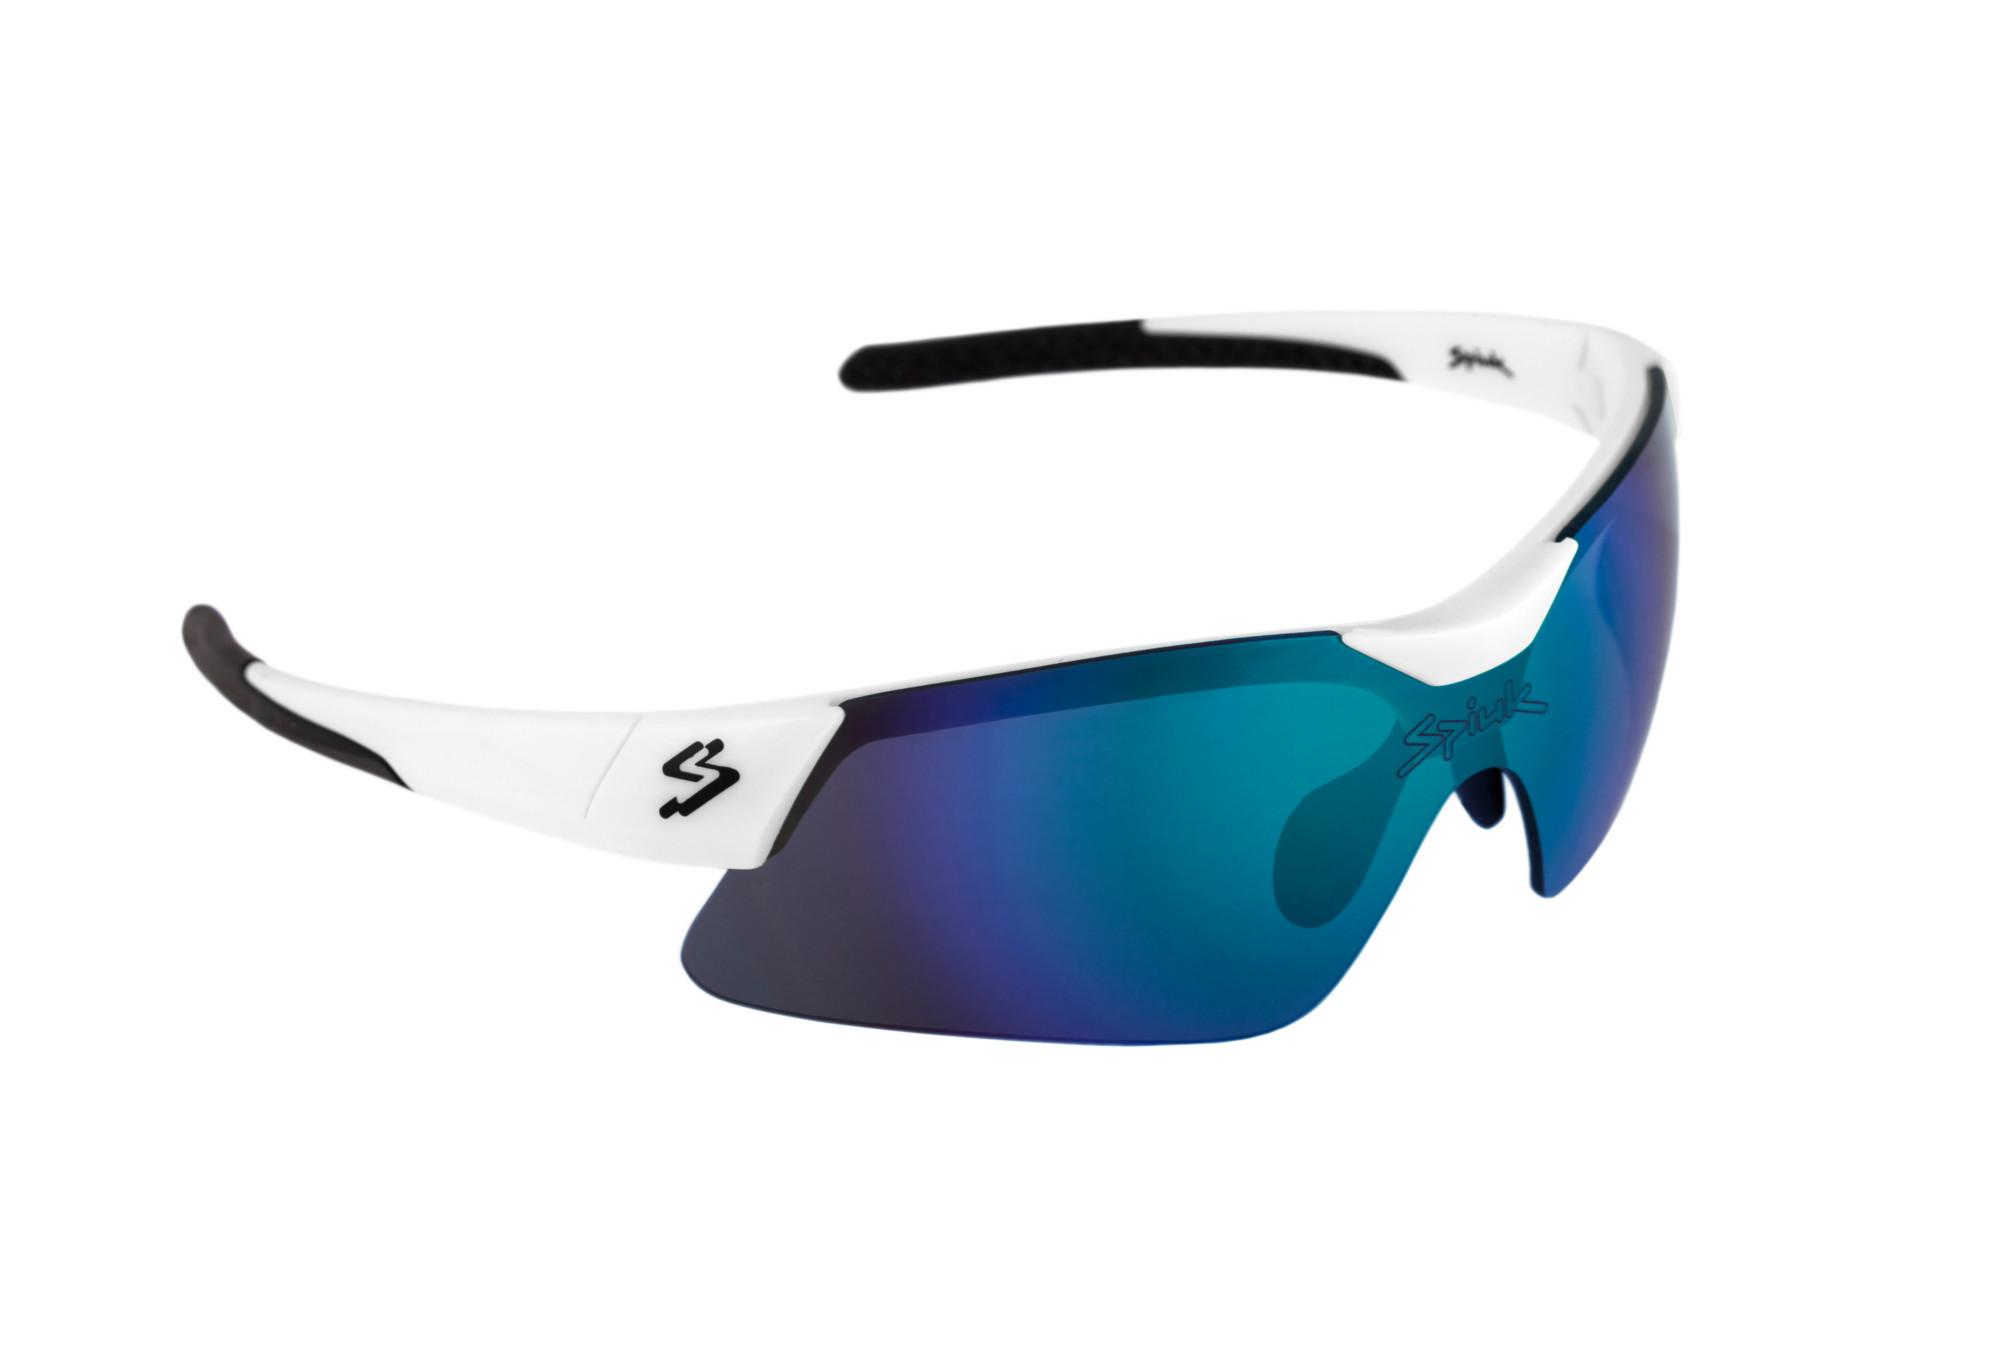 637e66737b Gafas de sol Spiuk Mamba Blanco / Negro   Alltricks.es